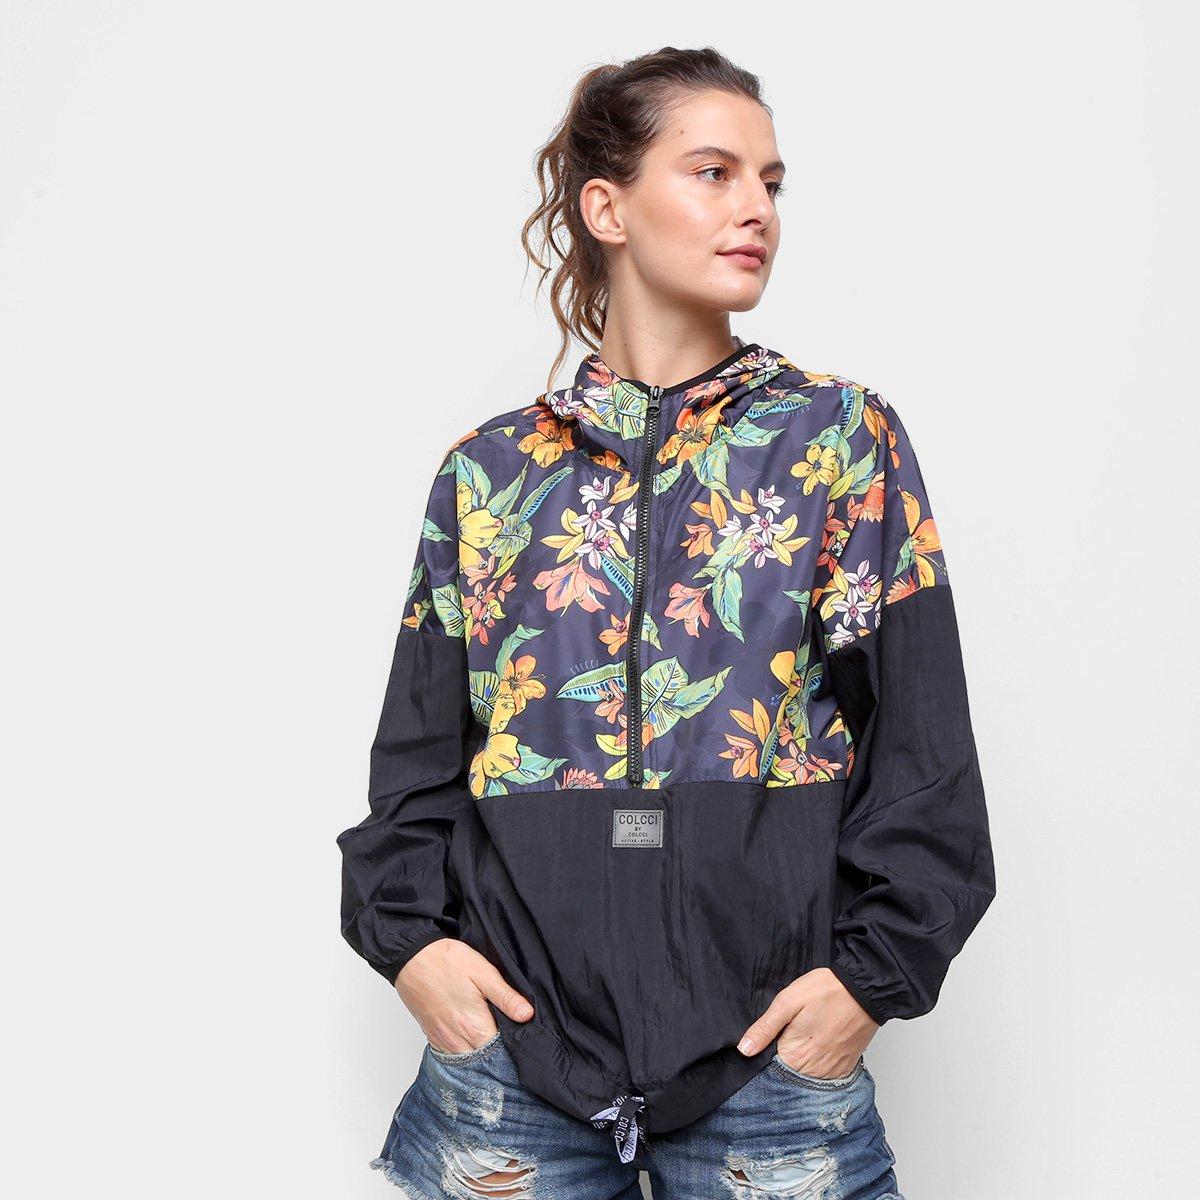 Blusão Colcci Floral Brasilis Feminino